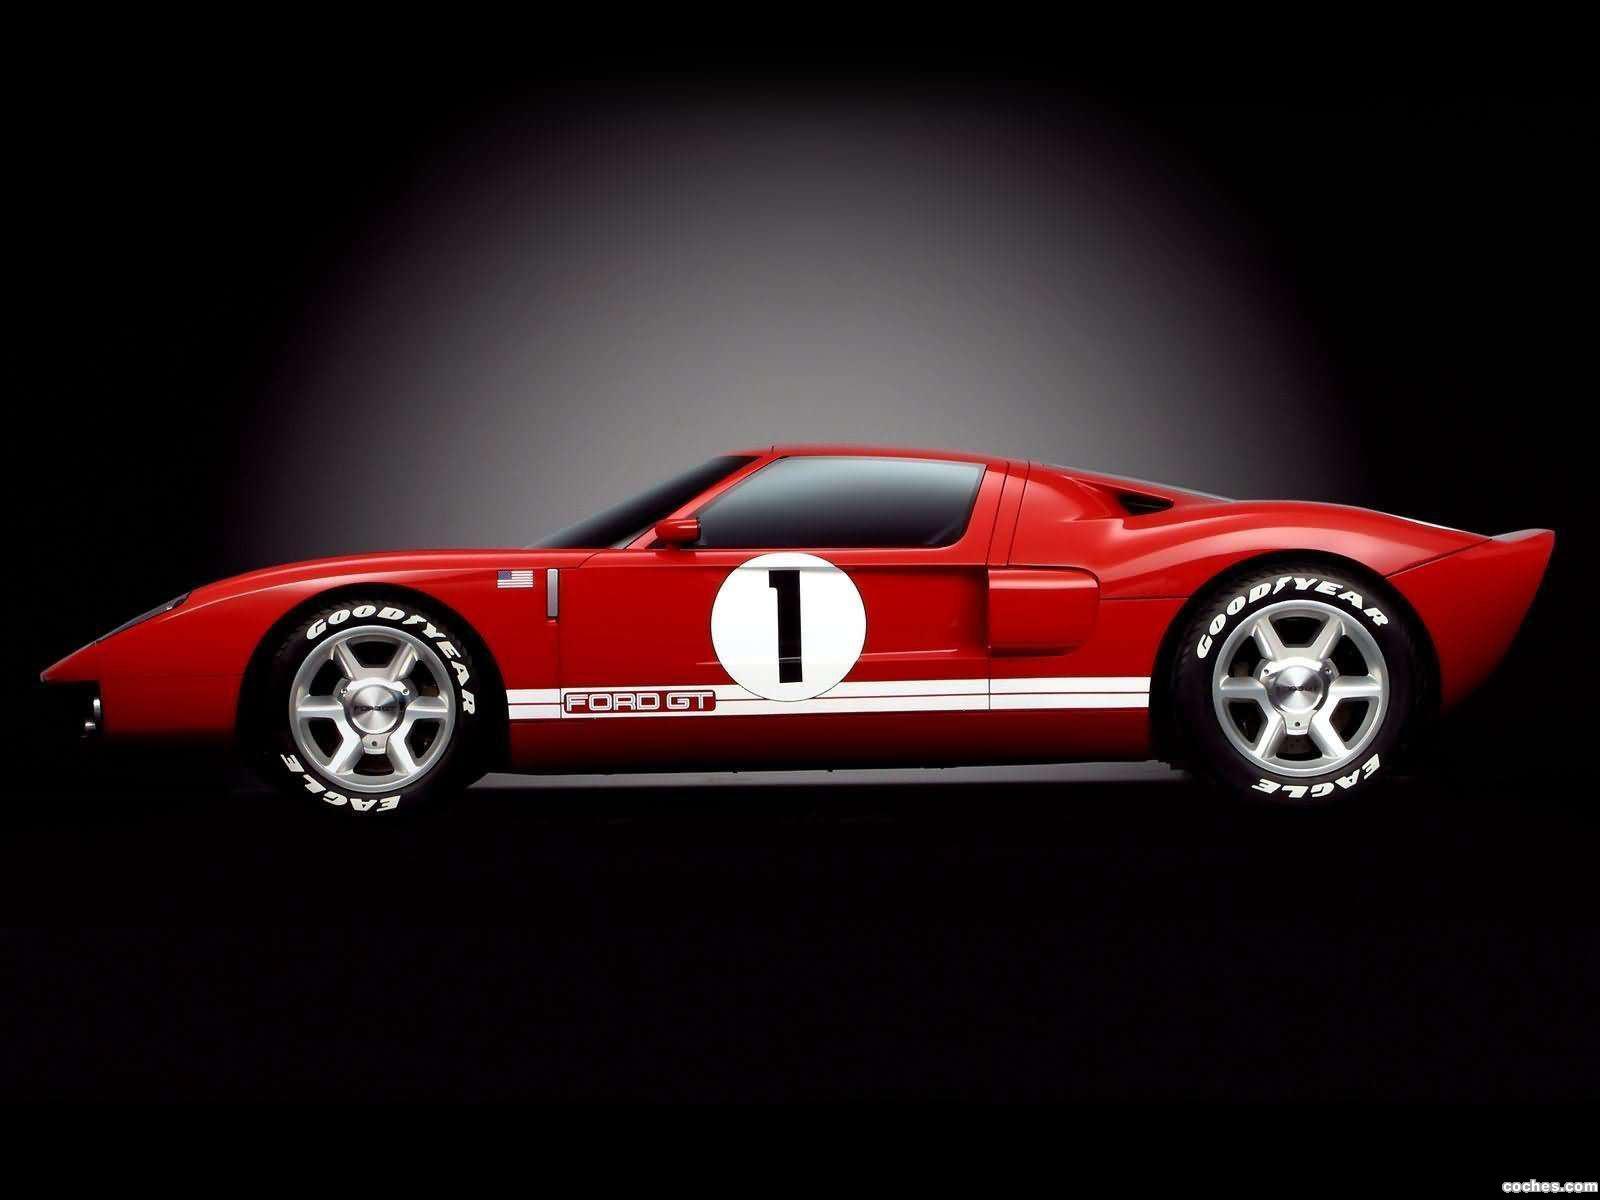 Foto 1 de Ford Concept 2003